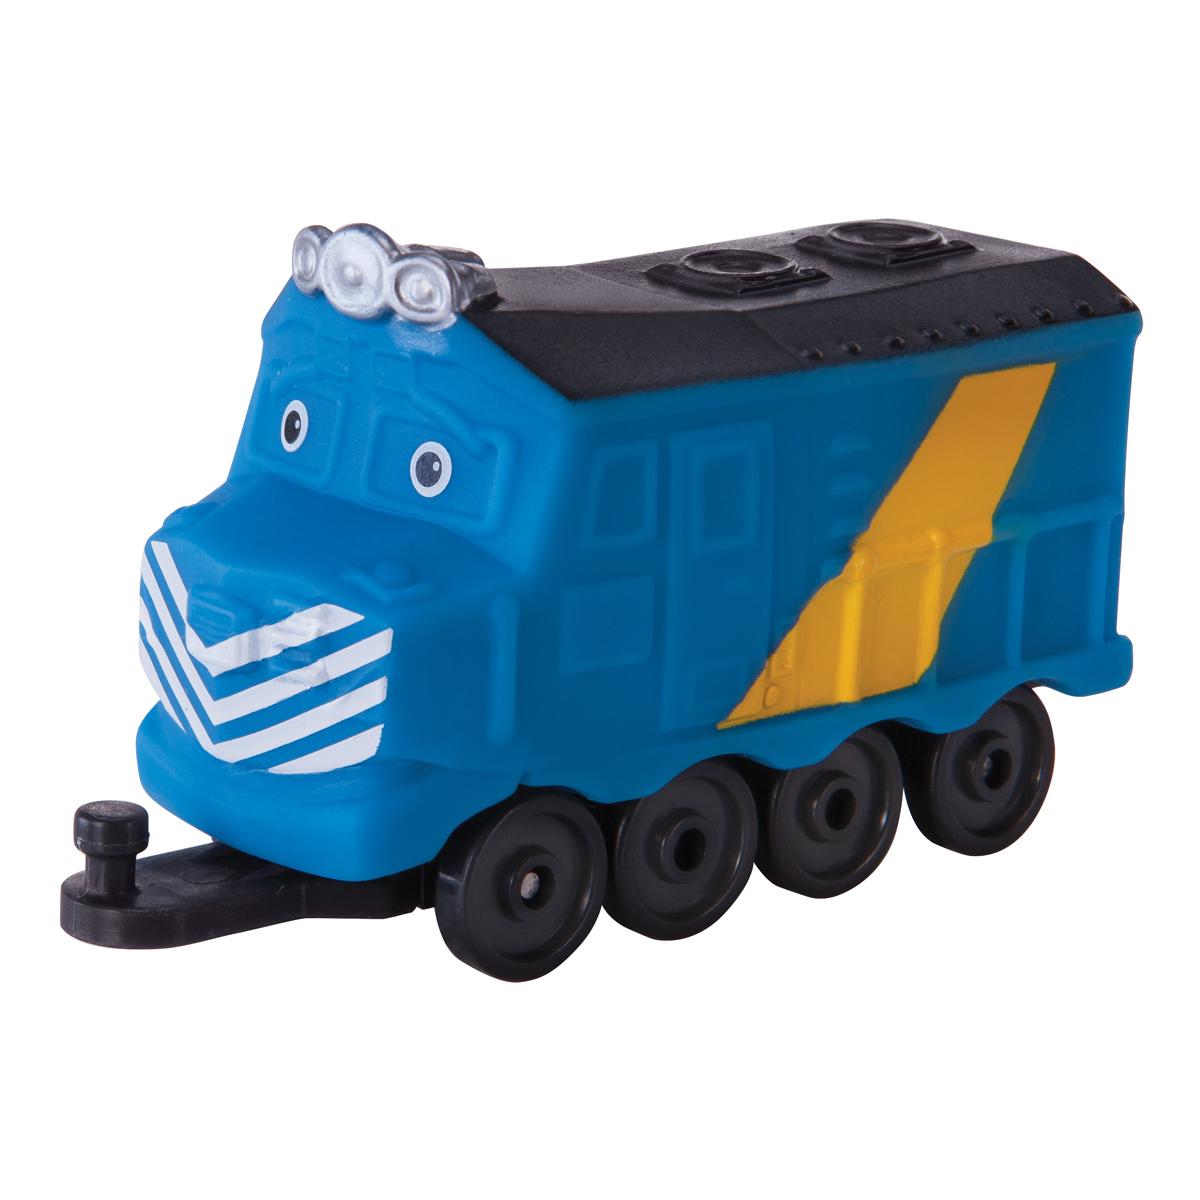 locomotiva chuggington little chuggers - zack